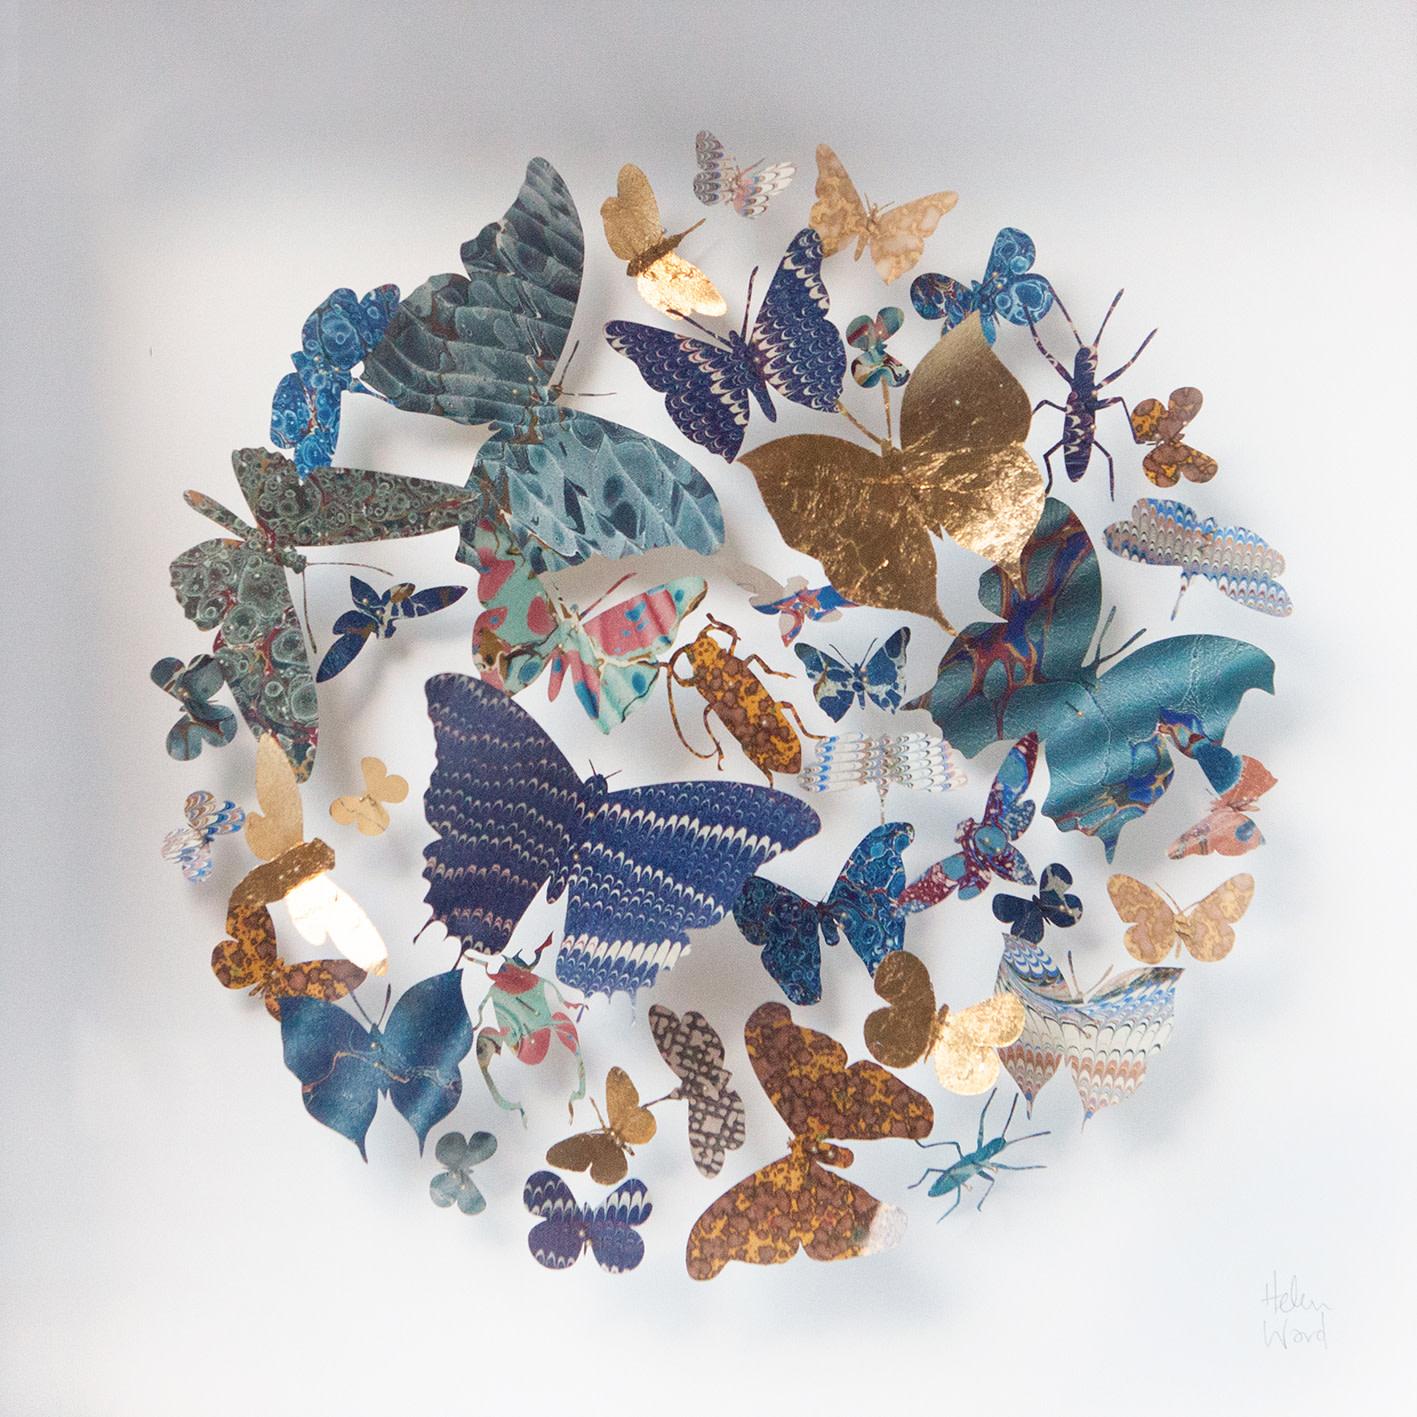 <span class=&#34;link fancybox-details-link&#34;><a href=&#34;/artists/142-helen-ward/works/6228-helen-ward-blue-flutter-2019/&#34;>View Detail Page</a></span><div class=&#34;artist&#34;><strong>Helen Ward</strong></div> <div class=&#34;title&#34;><em>Blue Flutter</em>, 2019</div> <div class=&#34;medium&#34;>Victorian entomology drawer, hand-marbled papers, enamel pins</div> <div class=&#34;dimensions&#34;>30 x 30 cm</div><div class=&#34;price&#34;>£480.00</div><div class=&#34;copyright_line&#34;>Own Art: £ 48 x 10 Monthly 0% APR Payments</div>